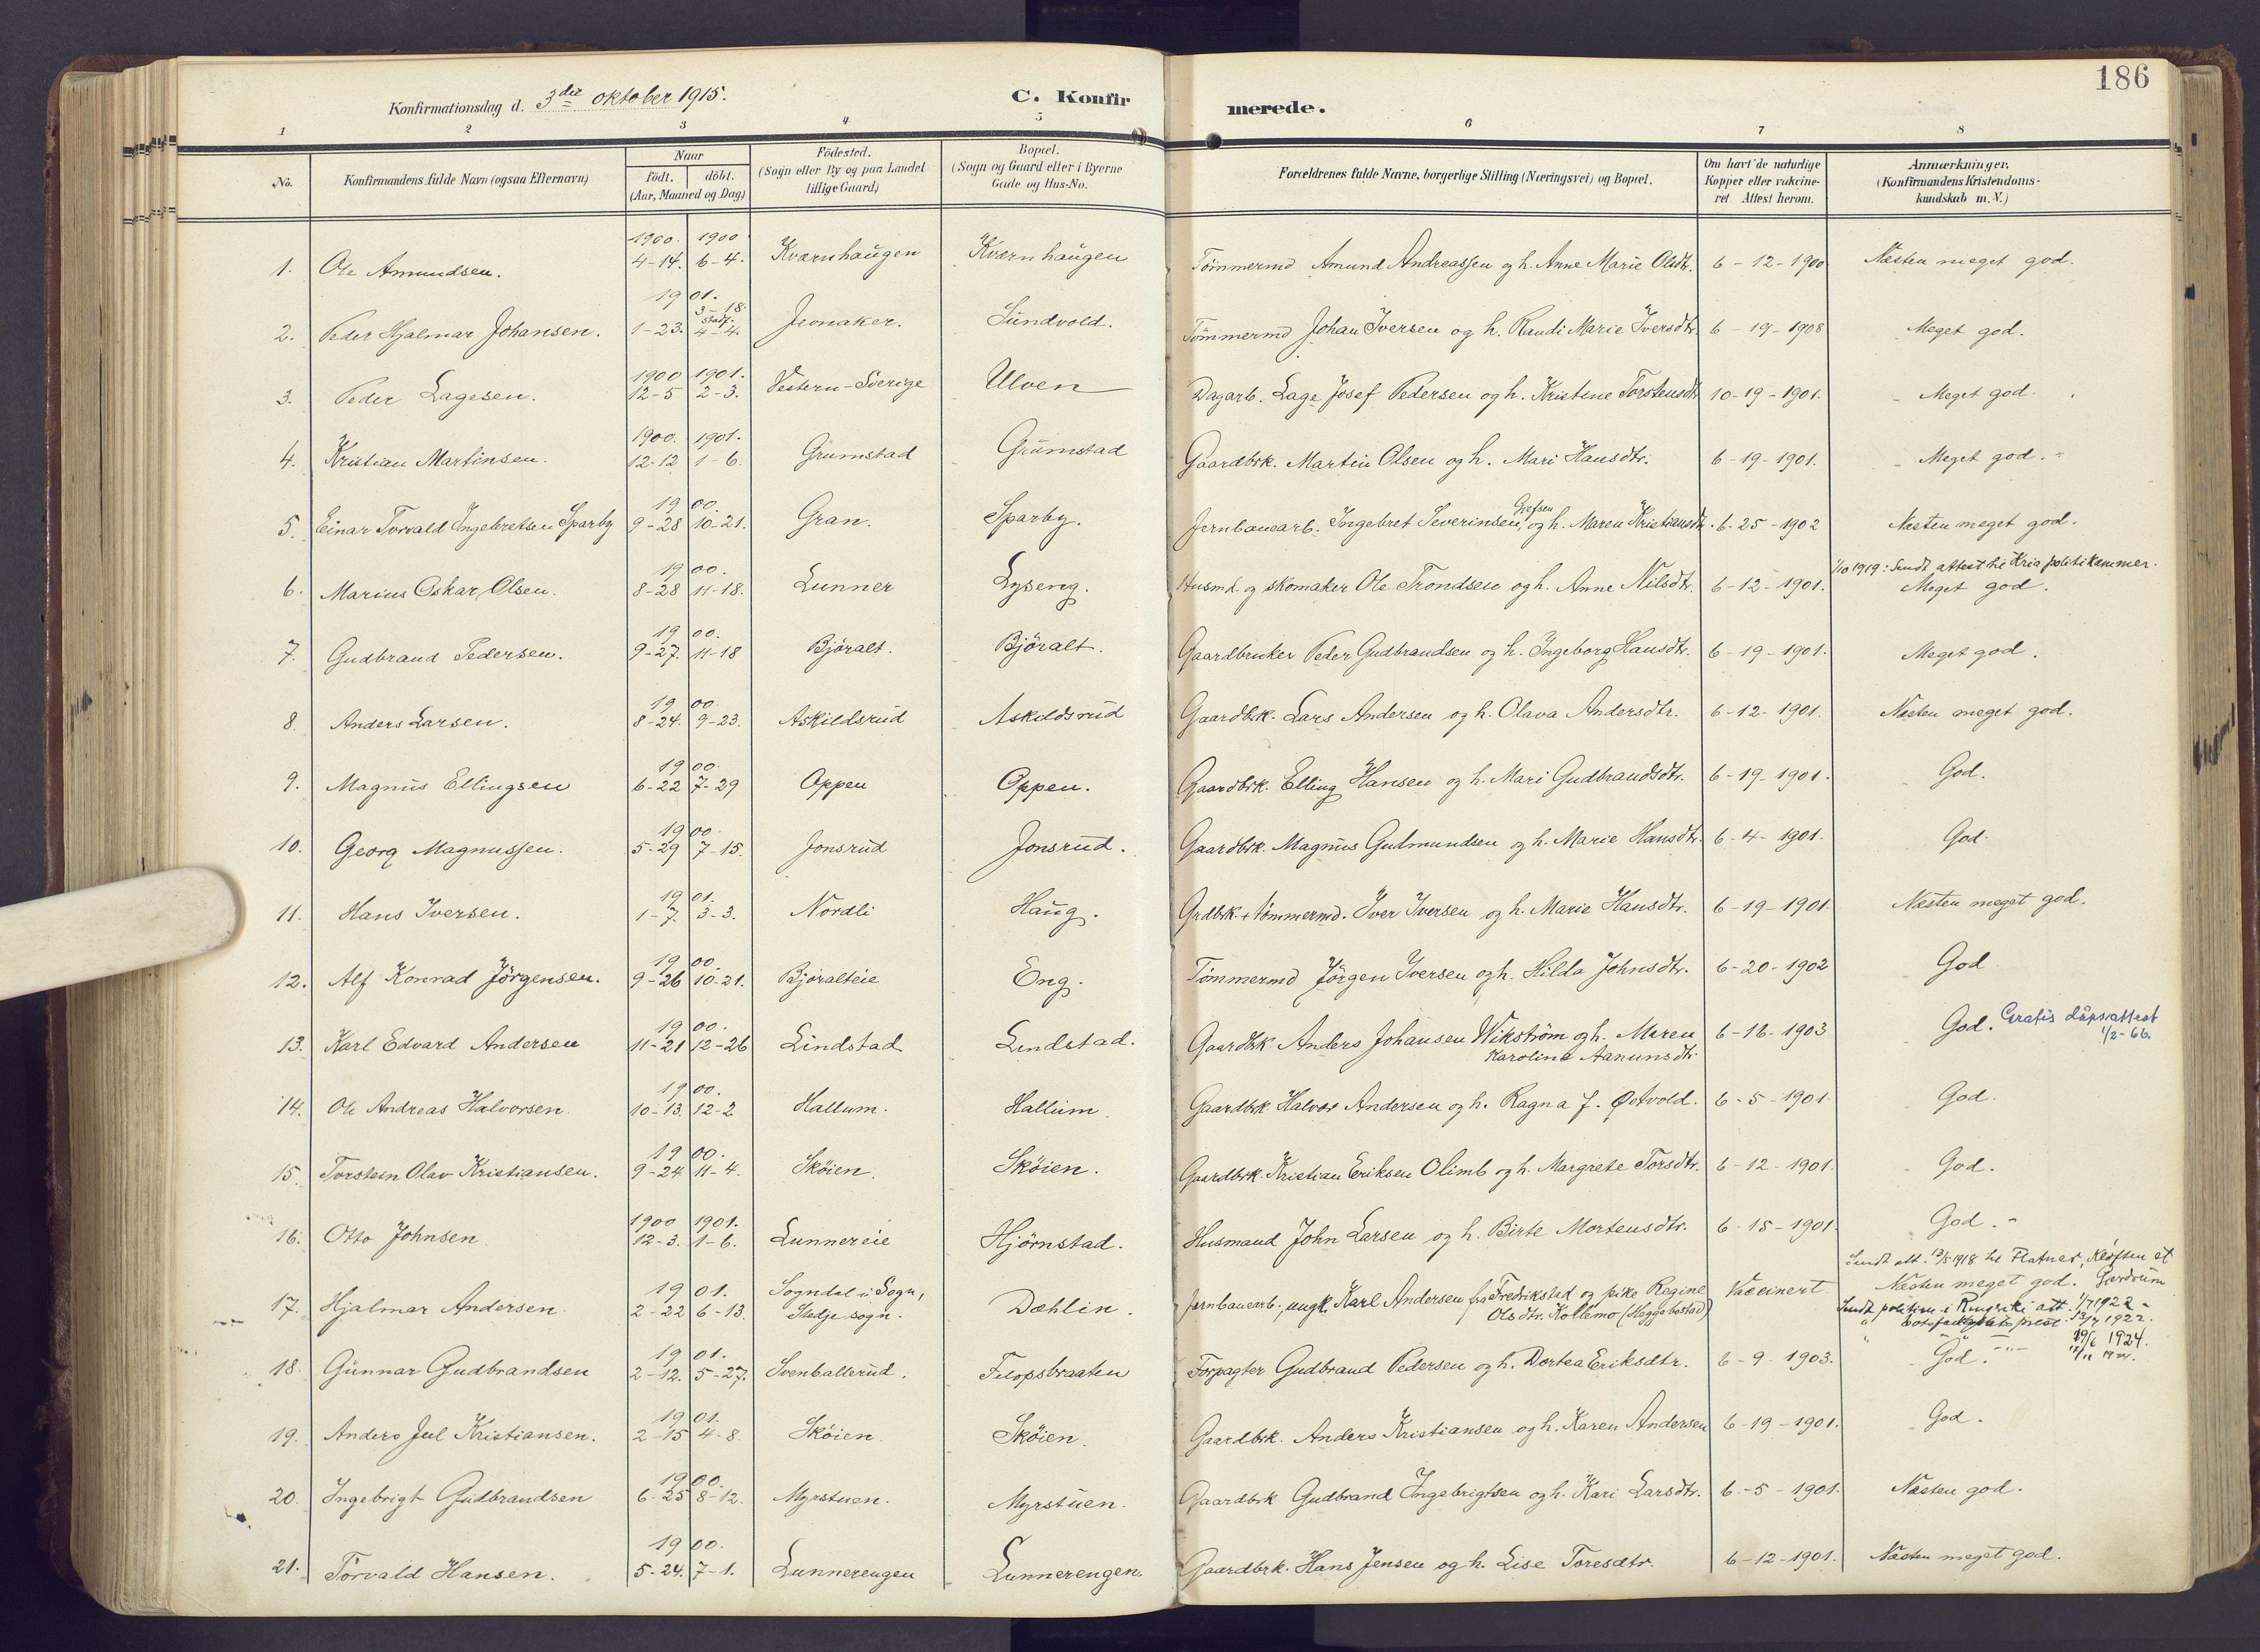 SAH, Lunner prestekontor, H/Ha/Haa/L0001: Ministerialbok nr. 1, 1907-1922, s. 186